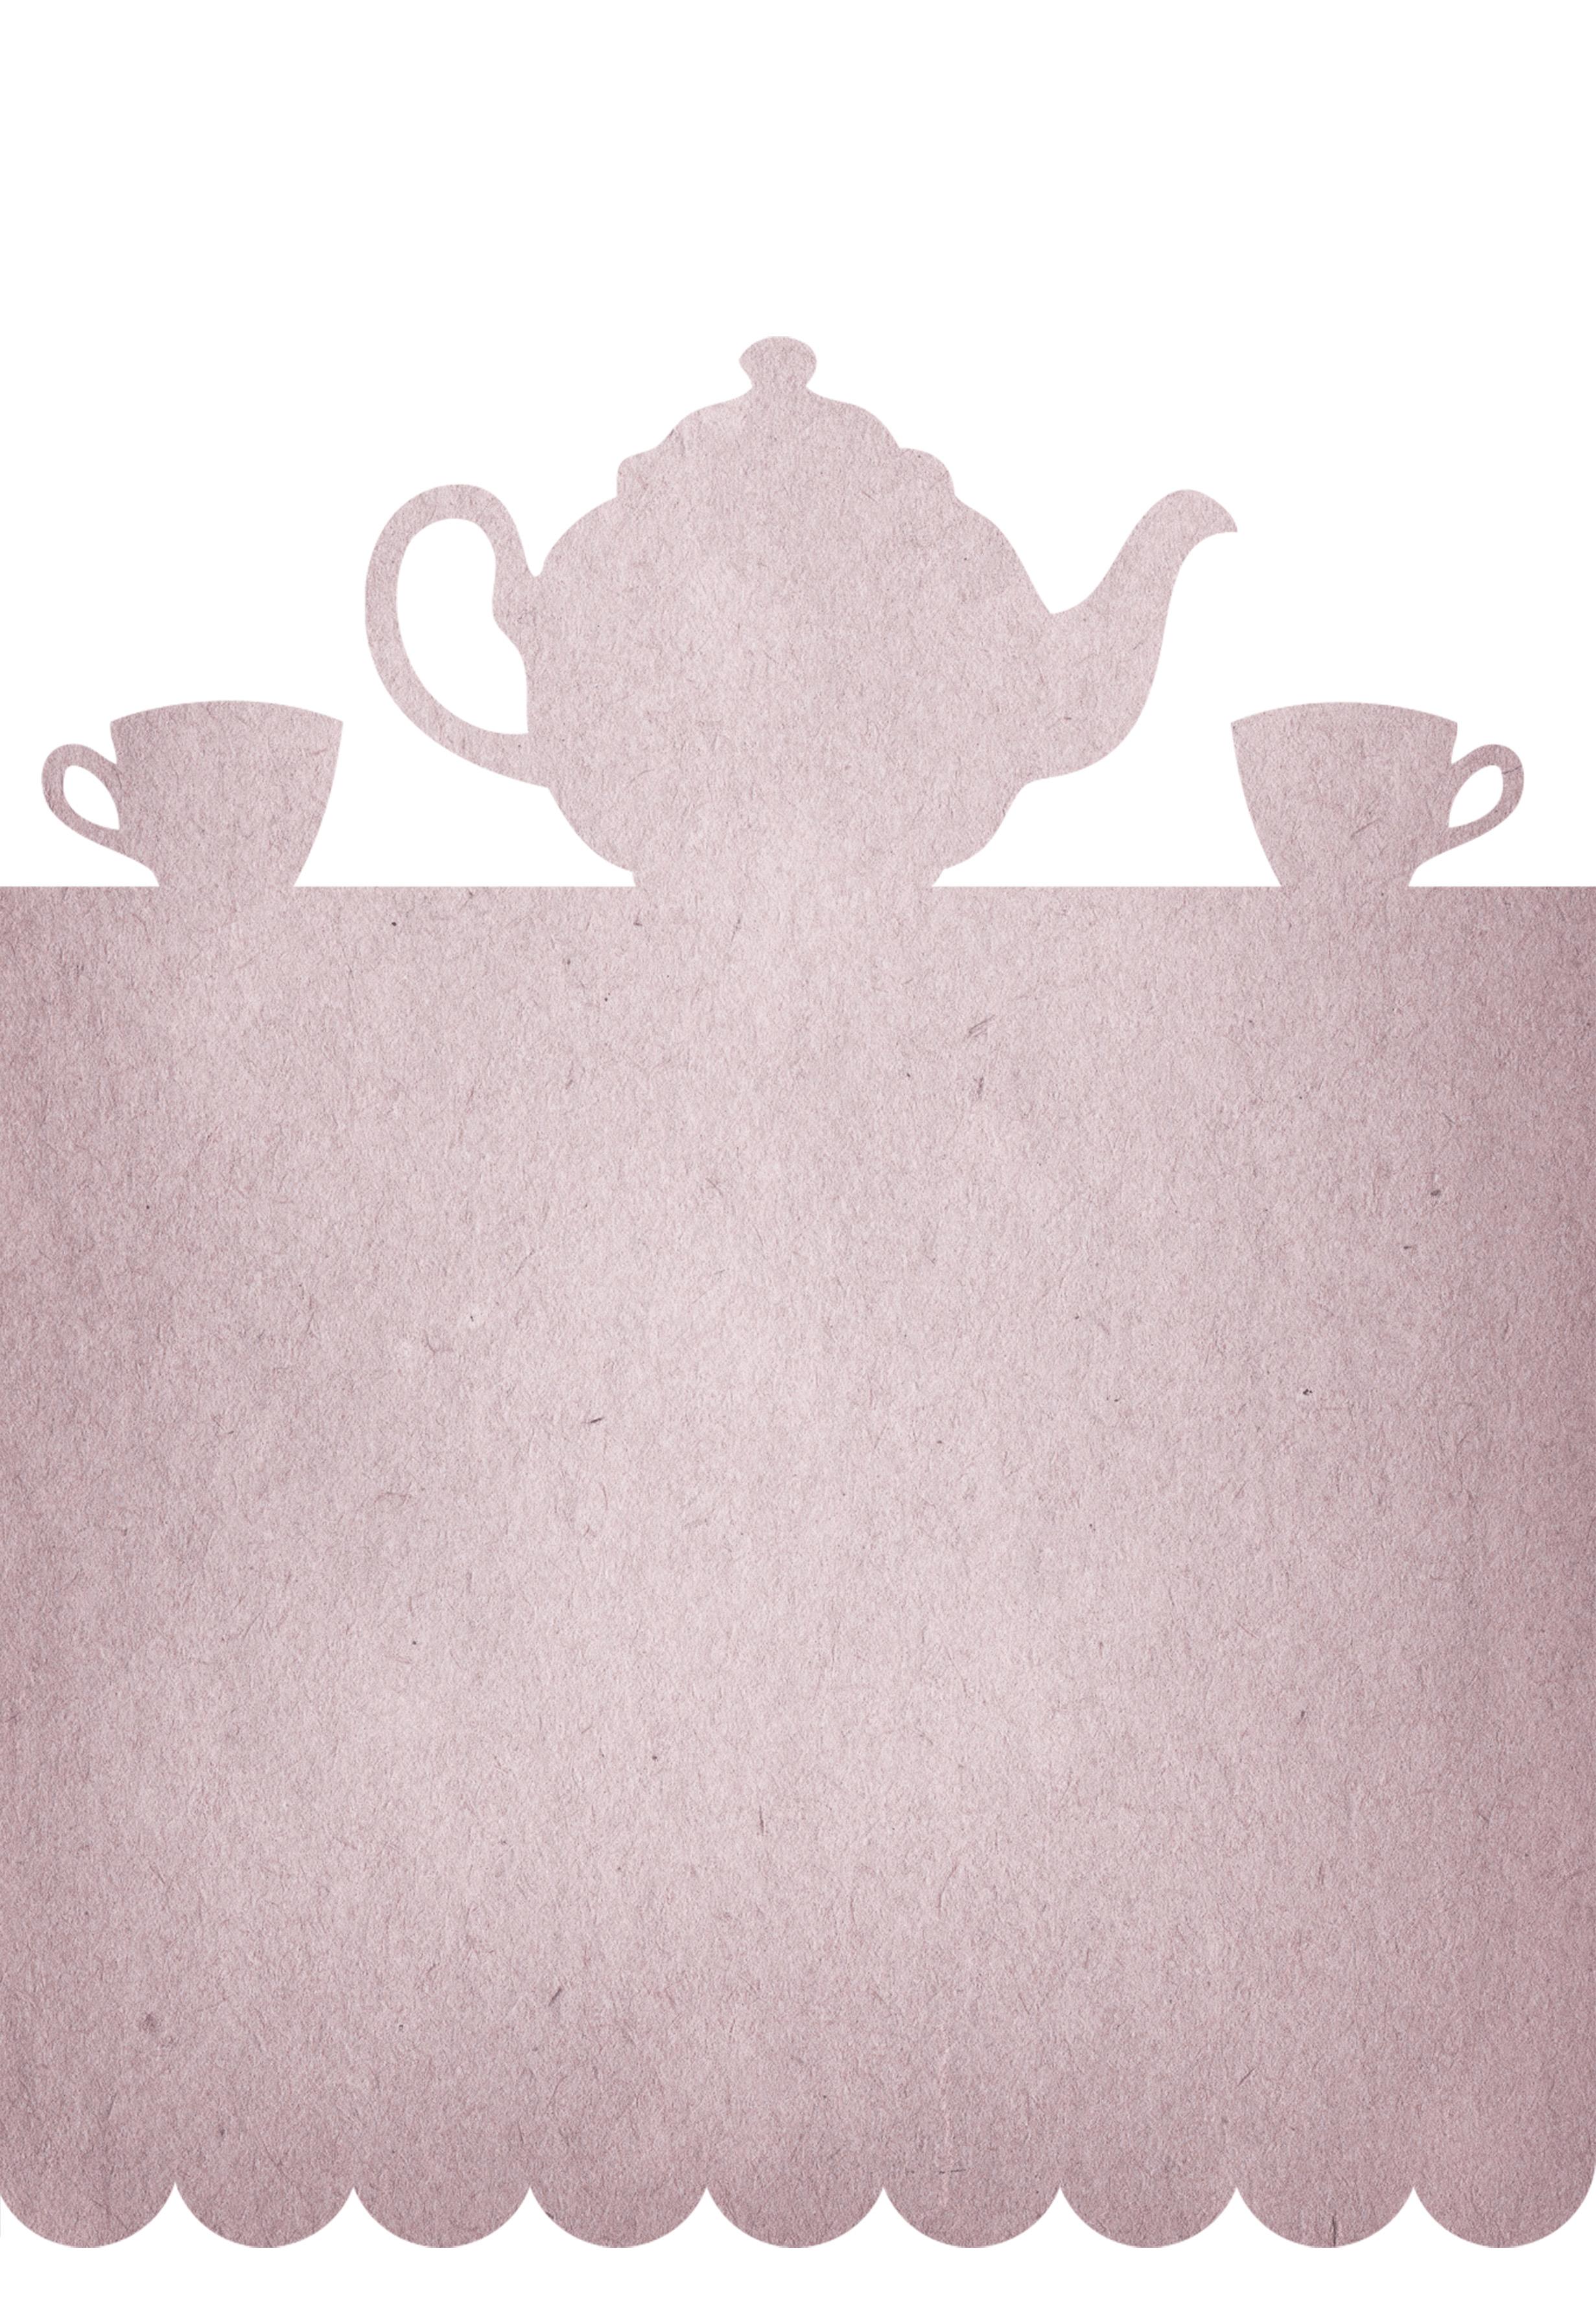 Tea Party - Free Printable Party Invitation Template | Greetings - Free Printable Kitchen Tea Invitation Templates